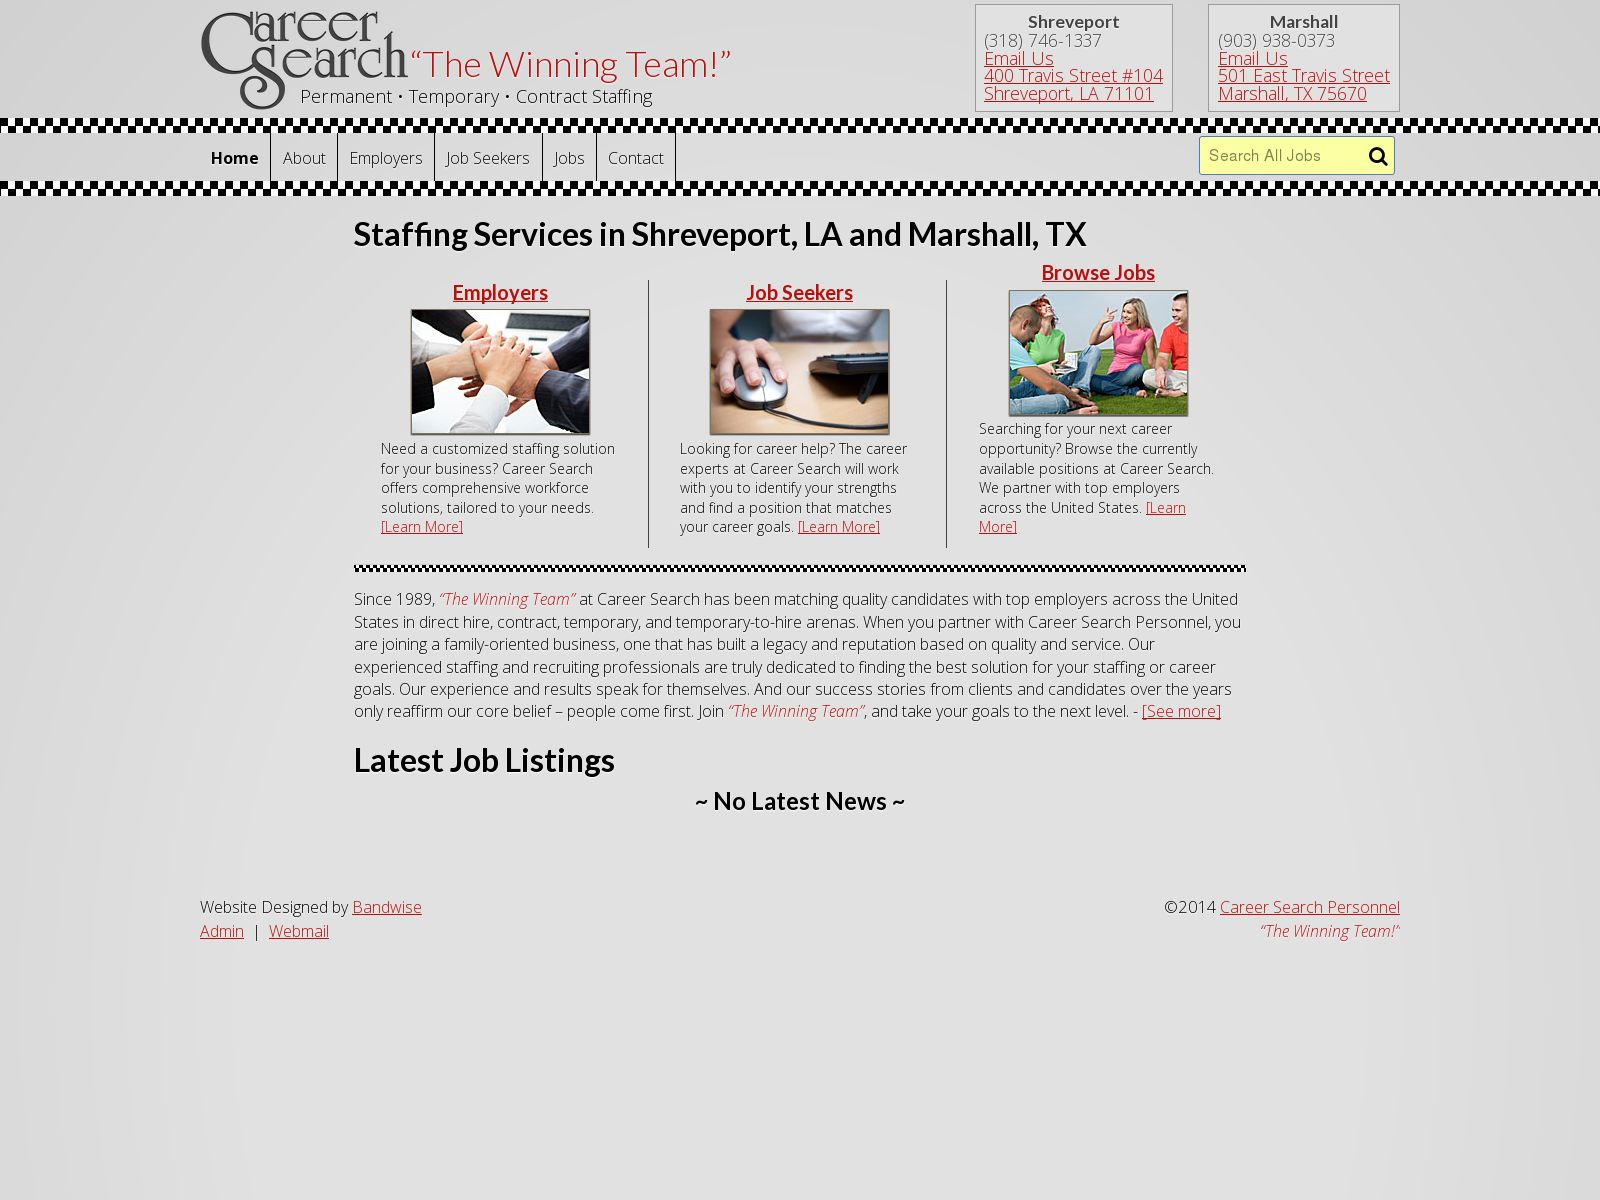 careersearchpersonnel_com